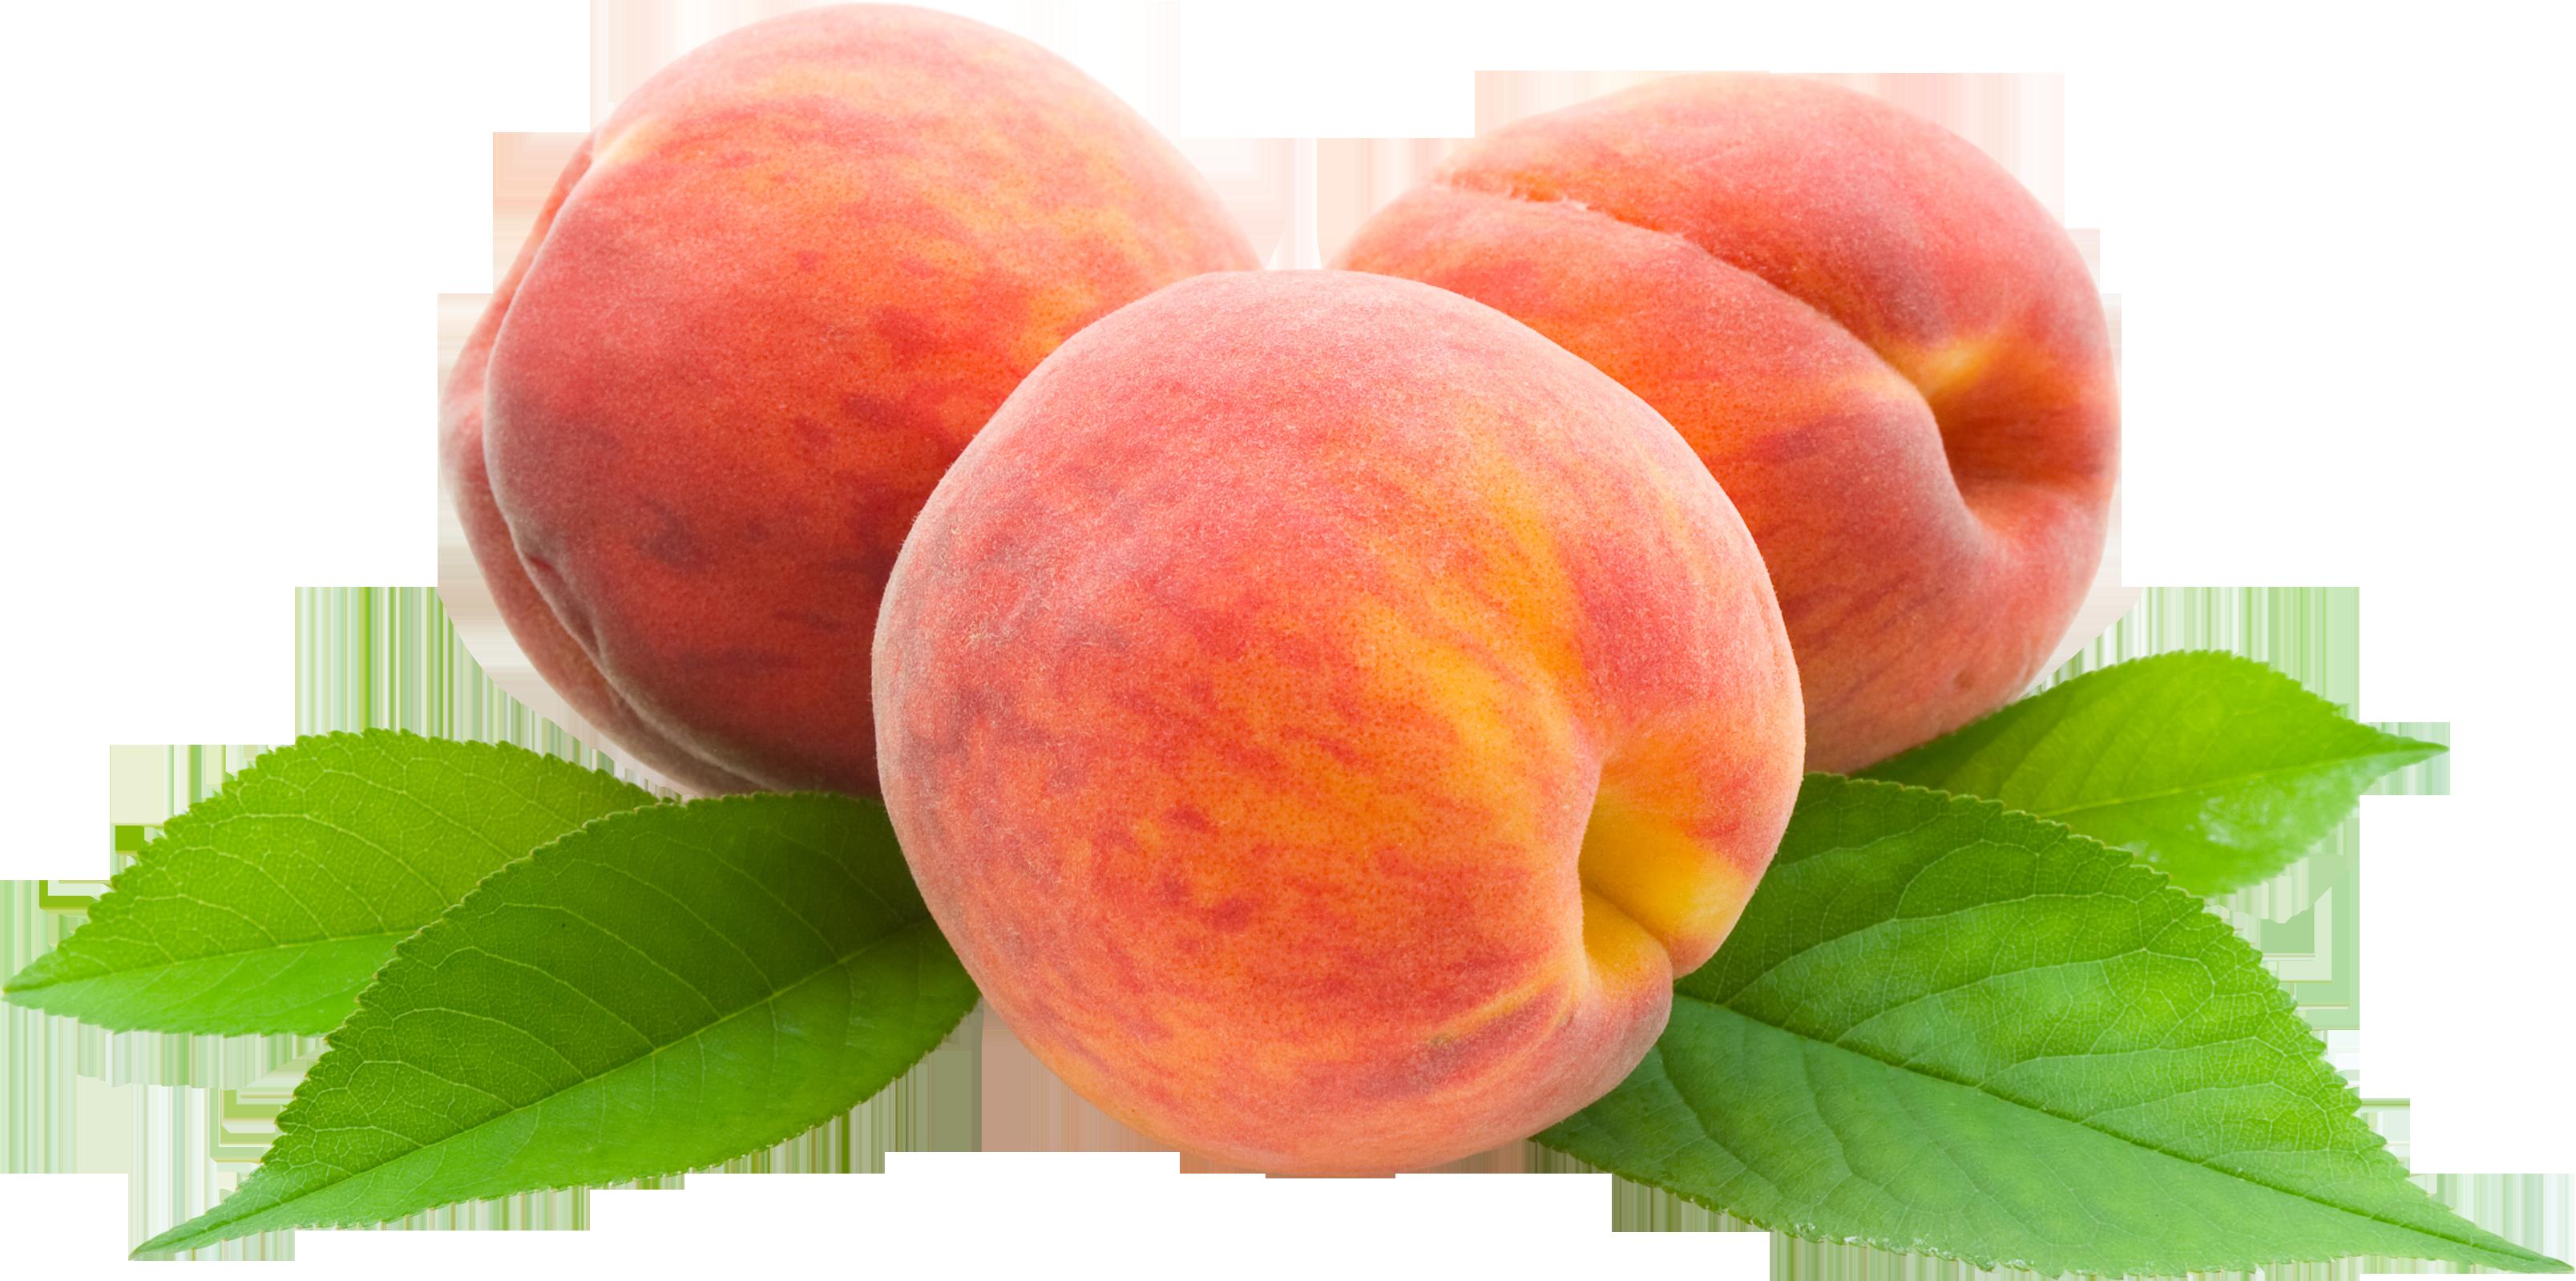 Suncrest Yellow Peach Tree